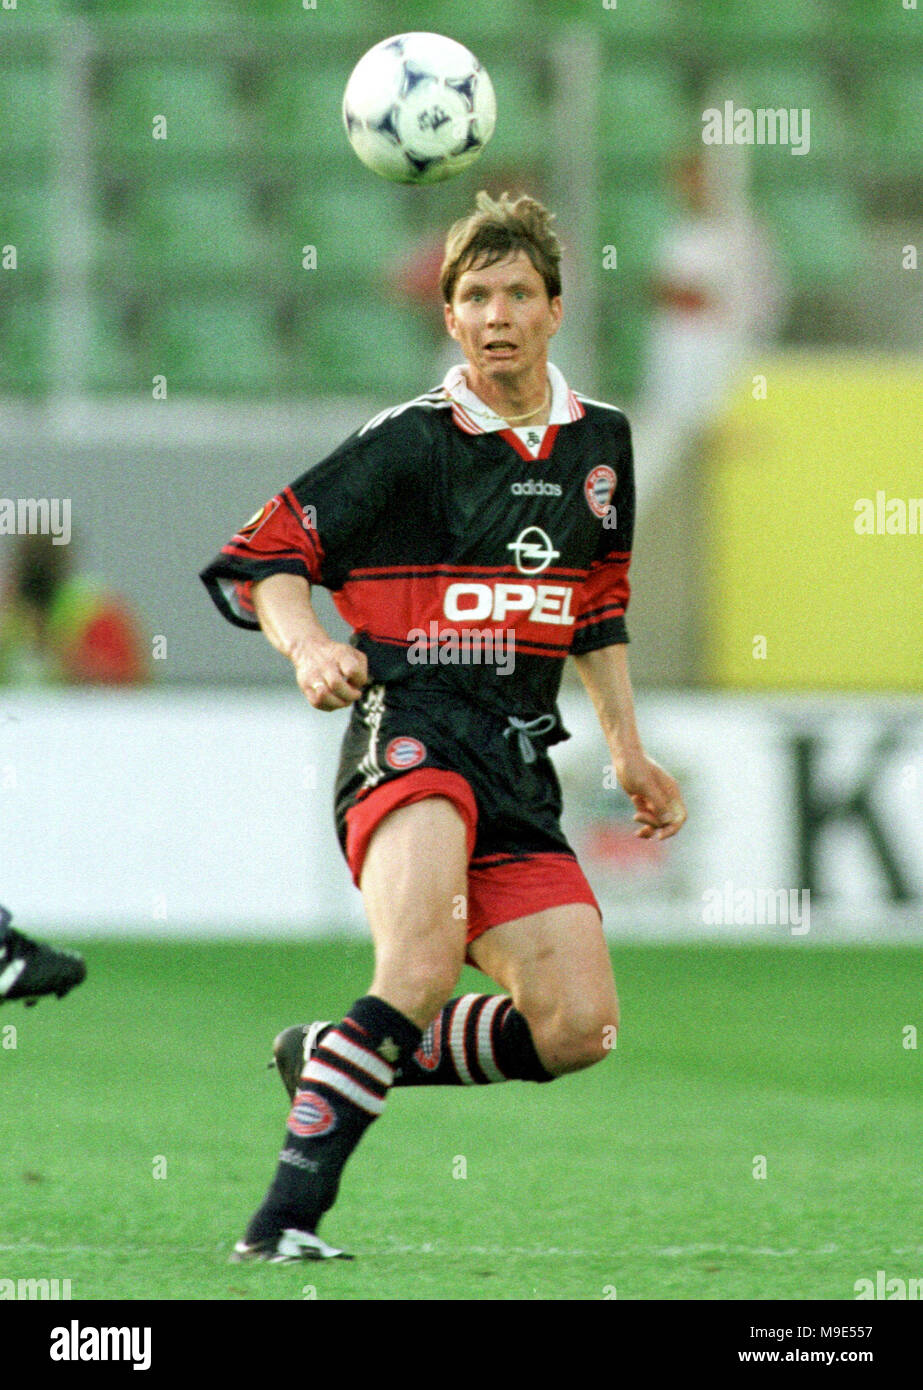 BayArena Leverkusen, Germany, 8.8.1998, German Liga-Cup Final, FC Bayern Munich vs VfB Stuttgart --- Michael TARNAT  (Munich) - Stock Image